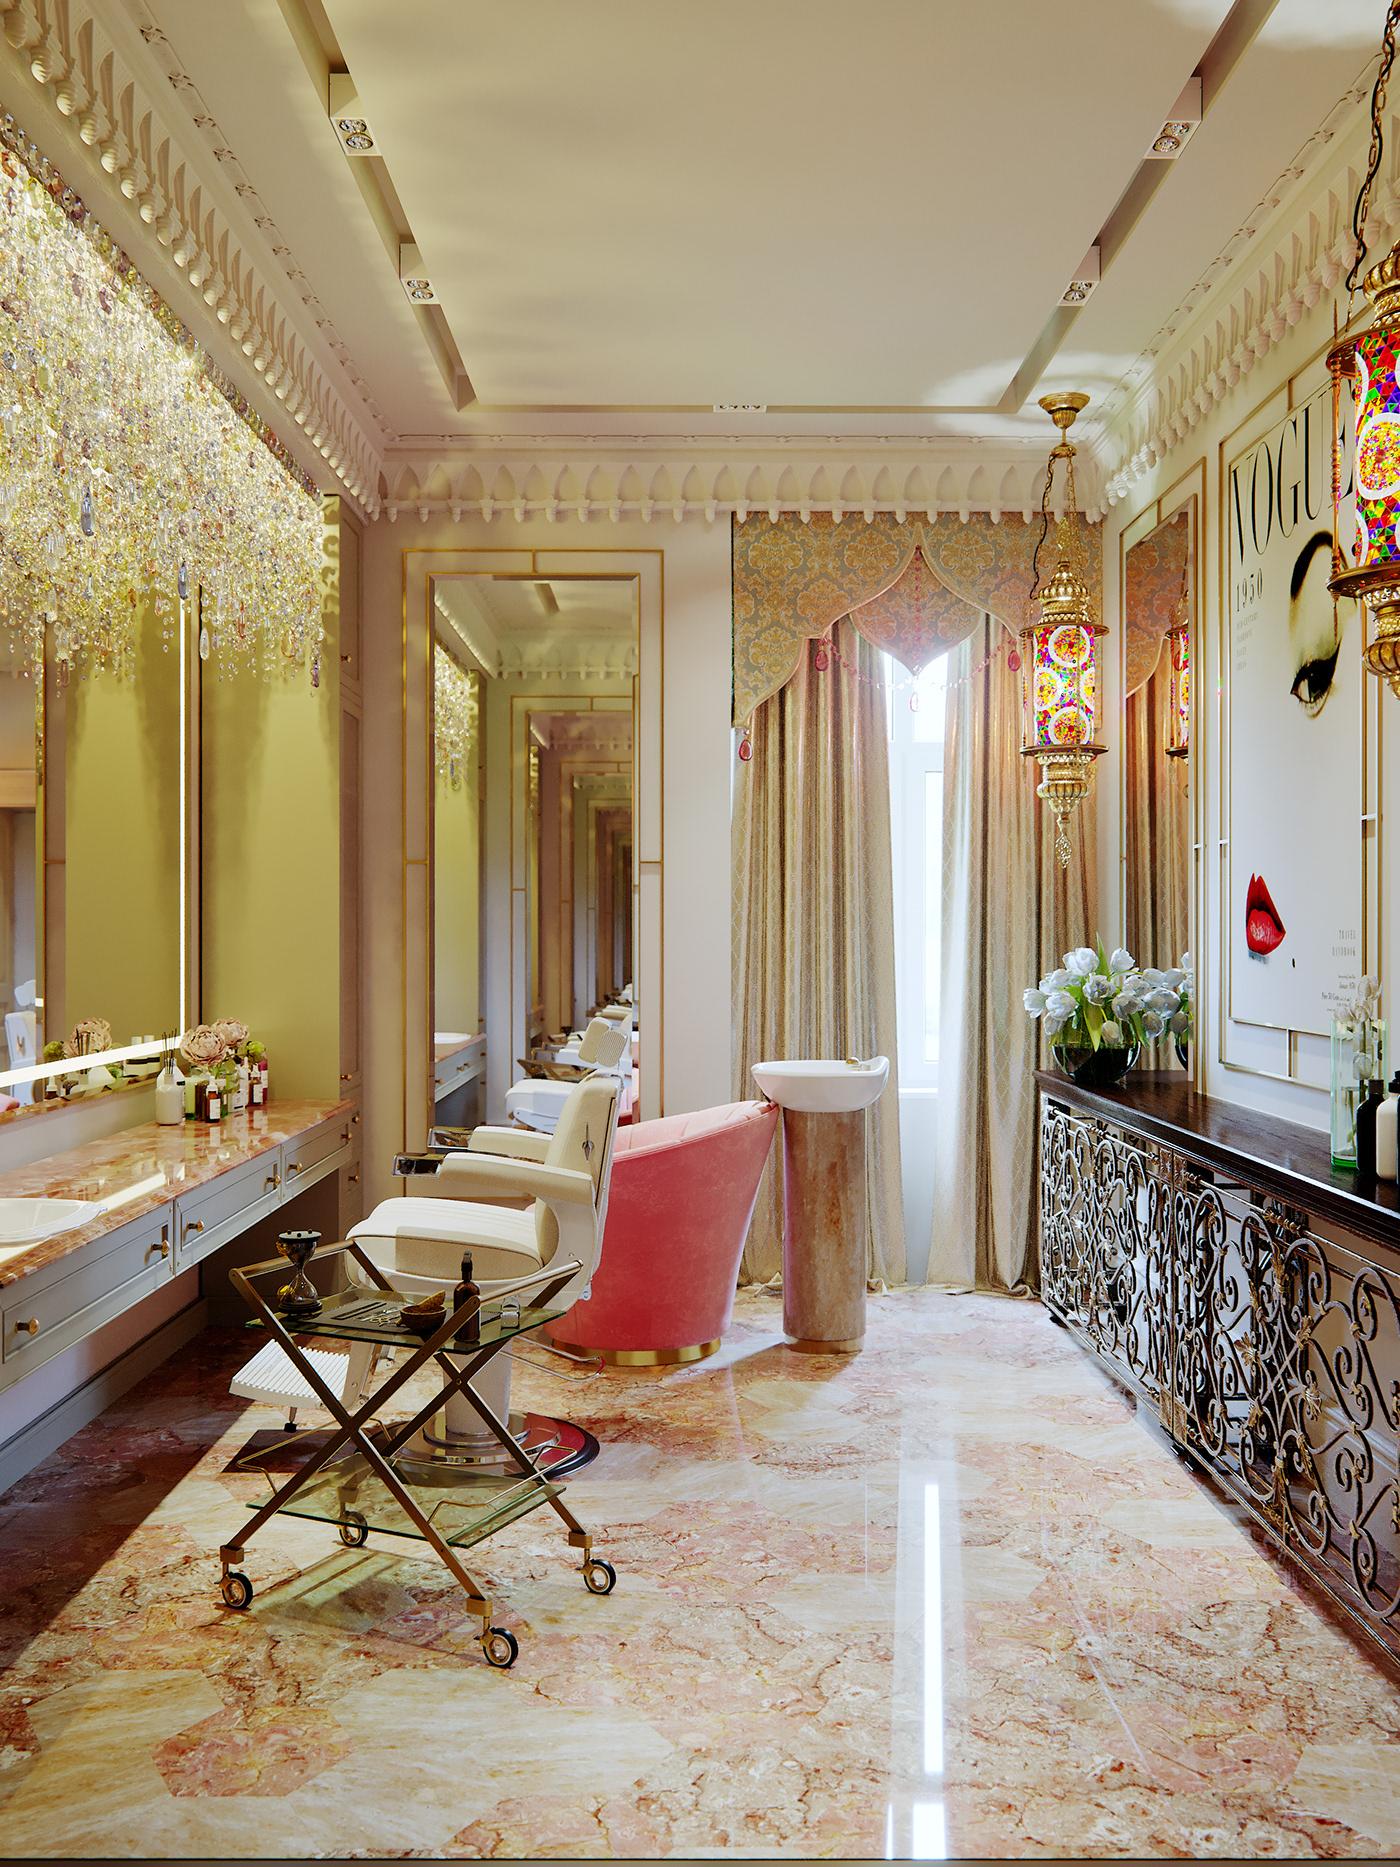 barber Interior clasics arabic Renderings